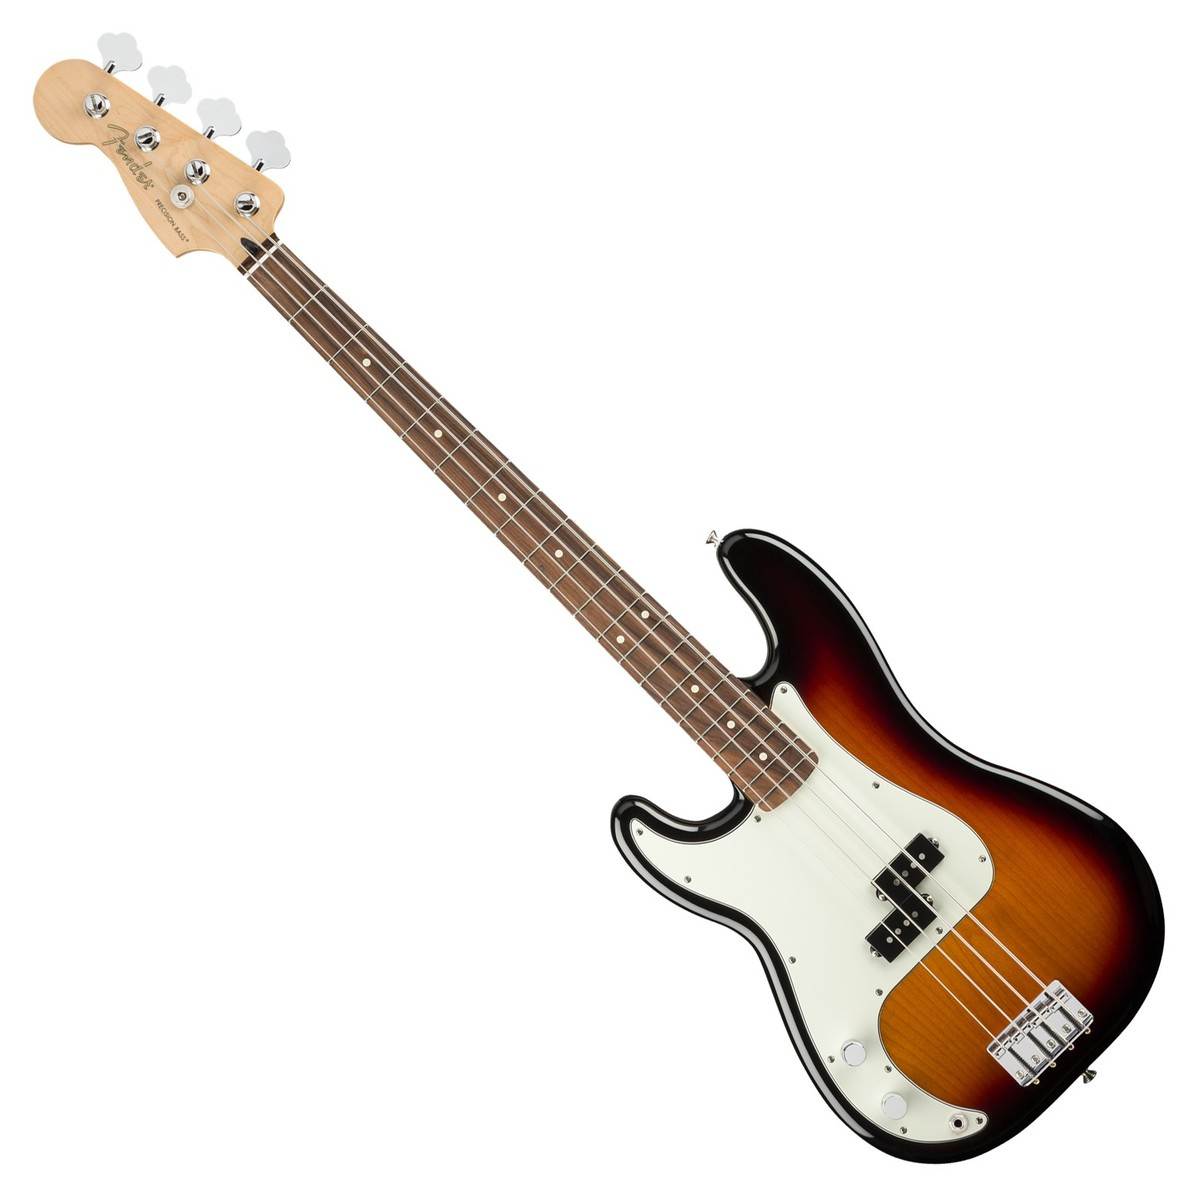 fender player precision bass pf left handed 3 tone sunburst at gear4music. Black Bedroom Furniture Sets. Home Design Ideas